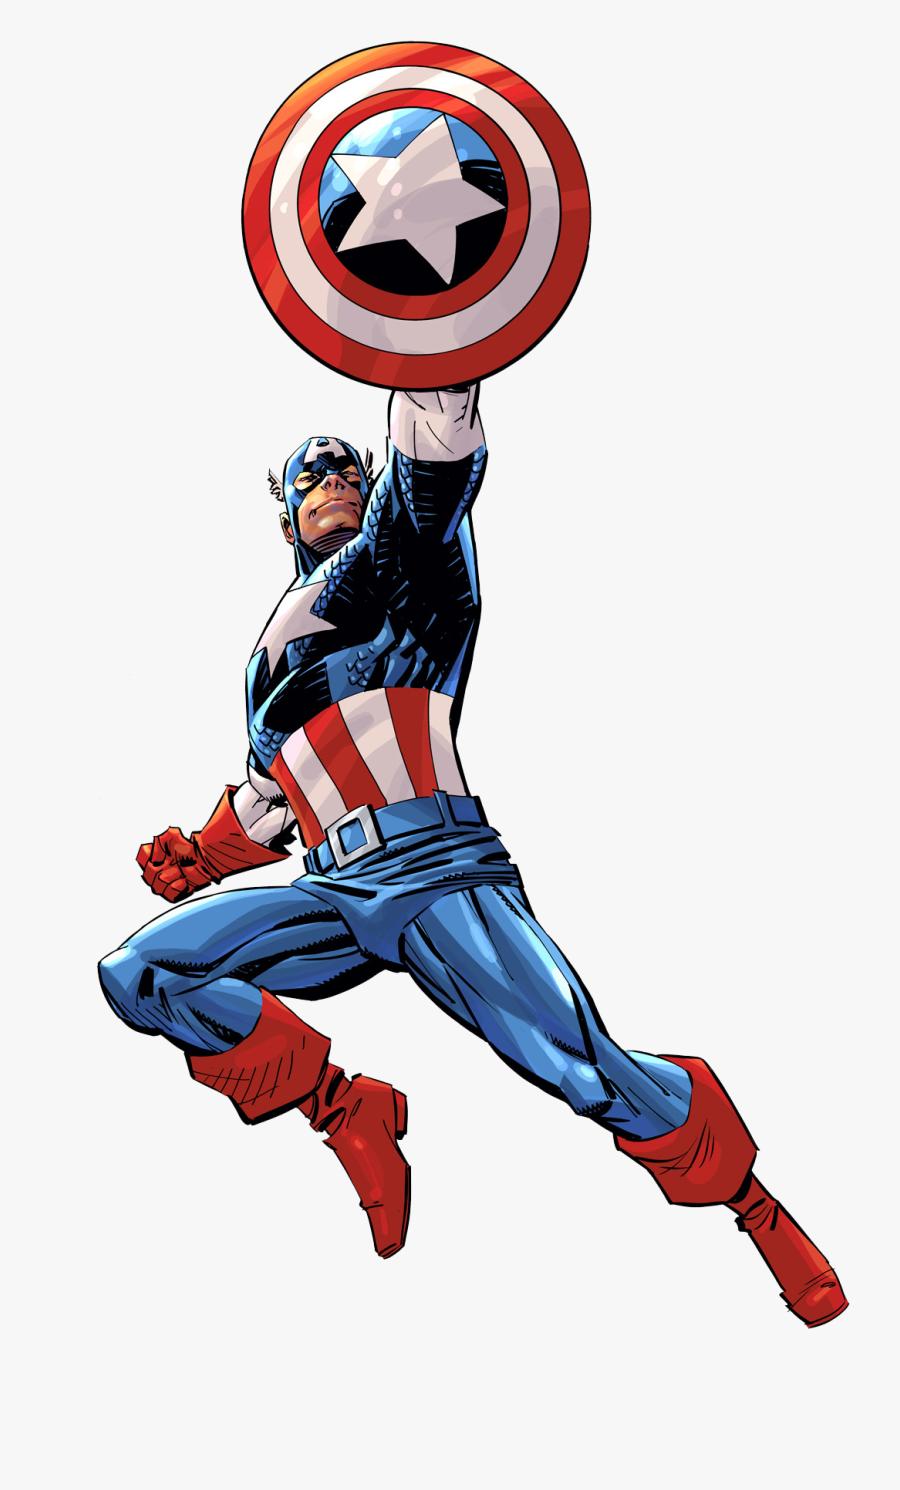 Giggles N Hugs Los Angeles Coupon Deal - Comic Captain America Transparent, Transparent Clipart